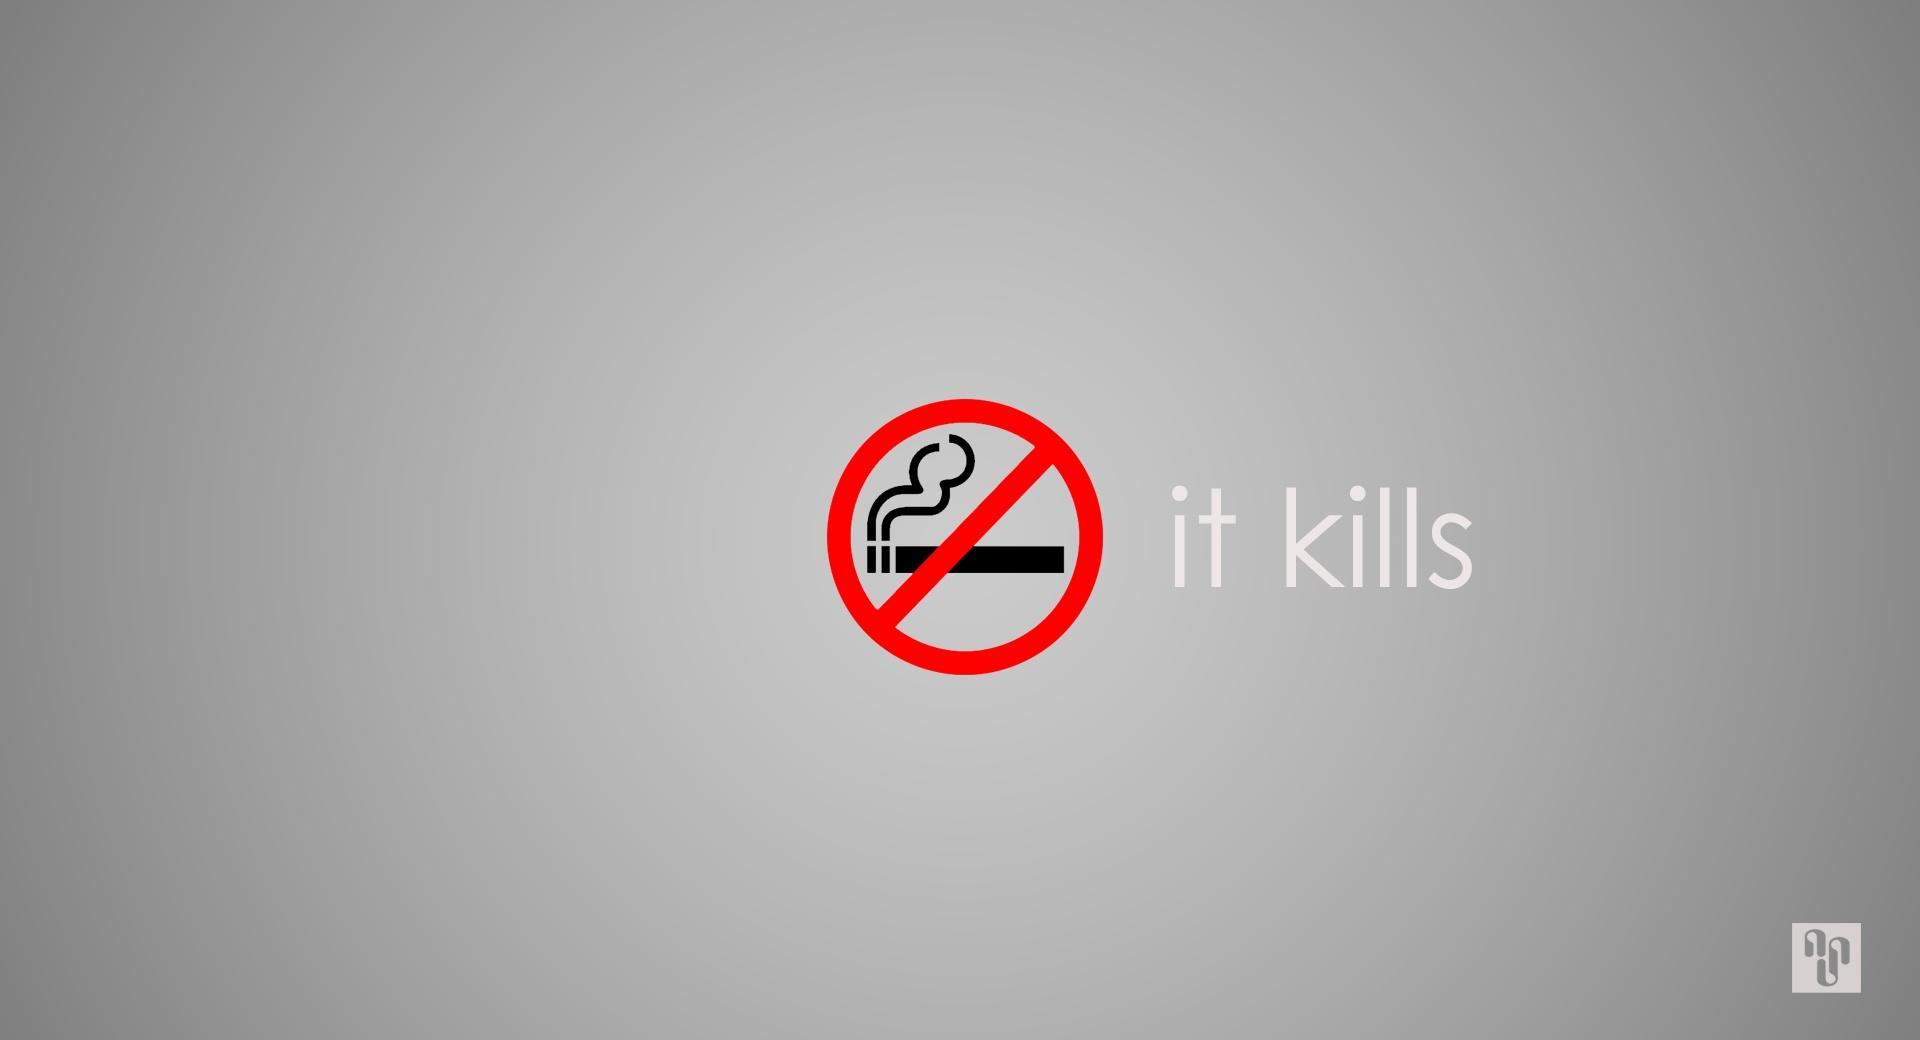 No Smoking, It Kills wallpapers HD quality